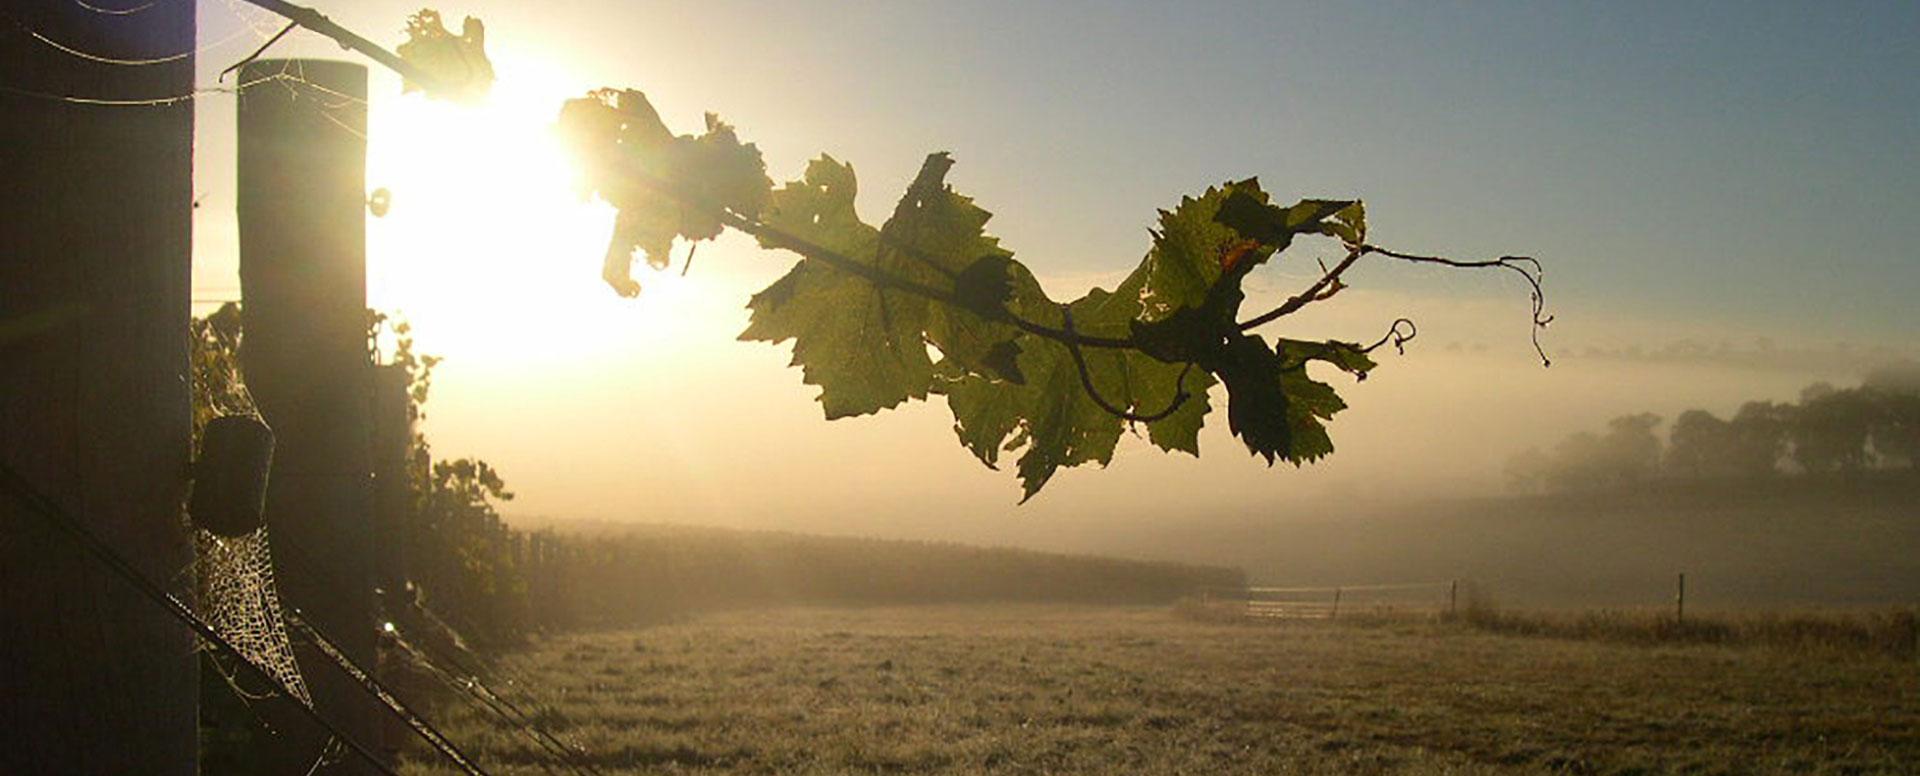 Patina vines sun rise